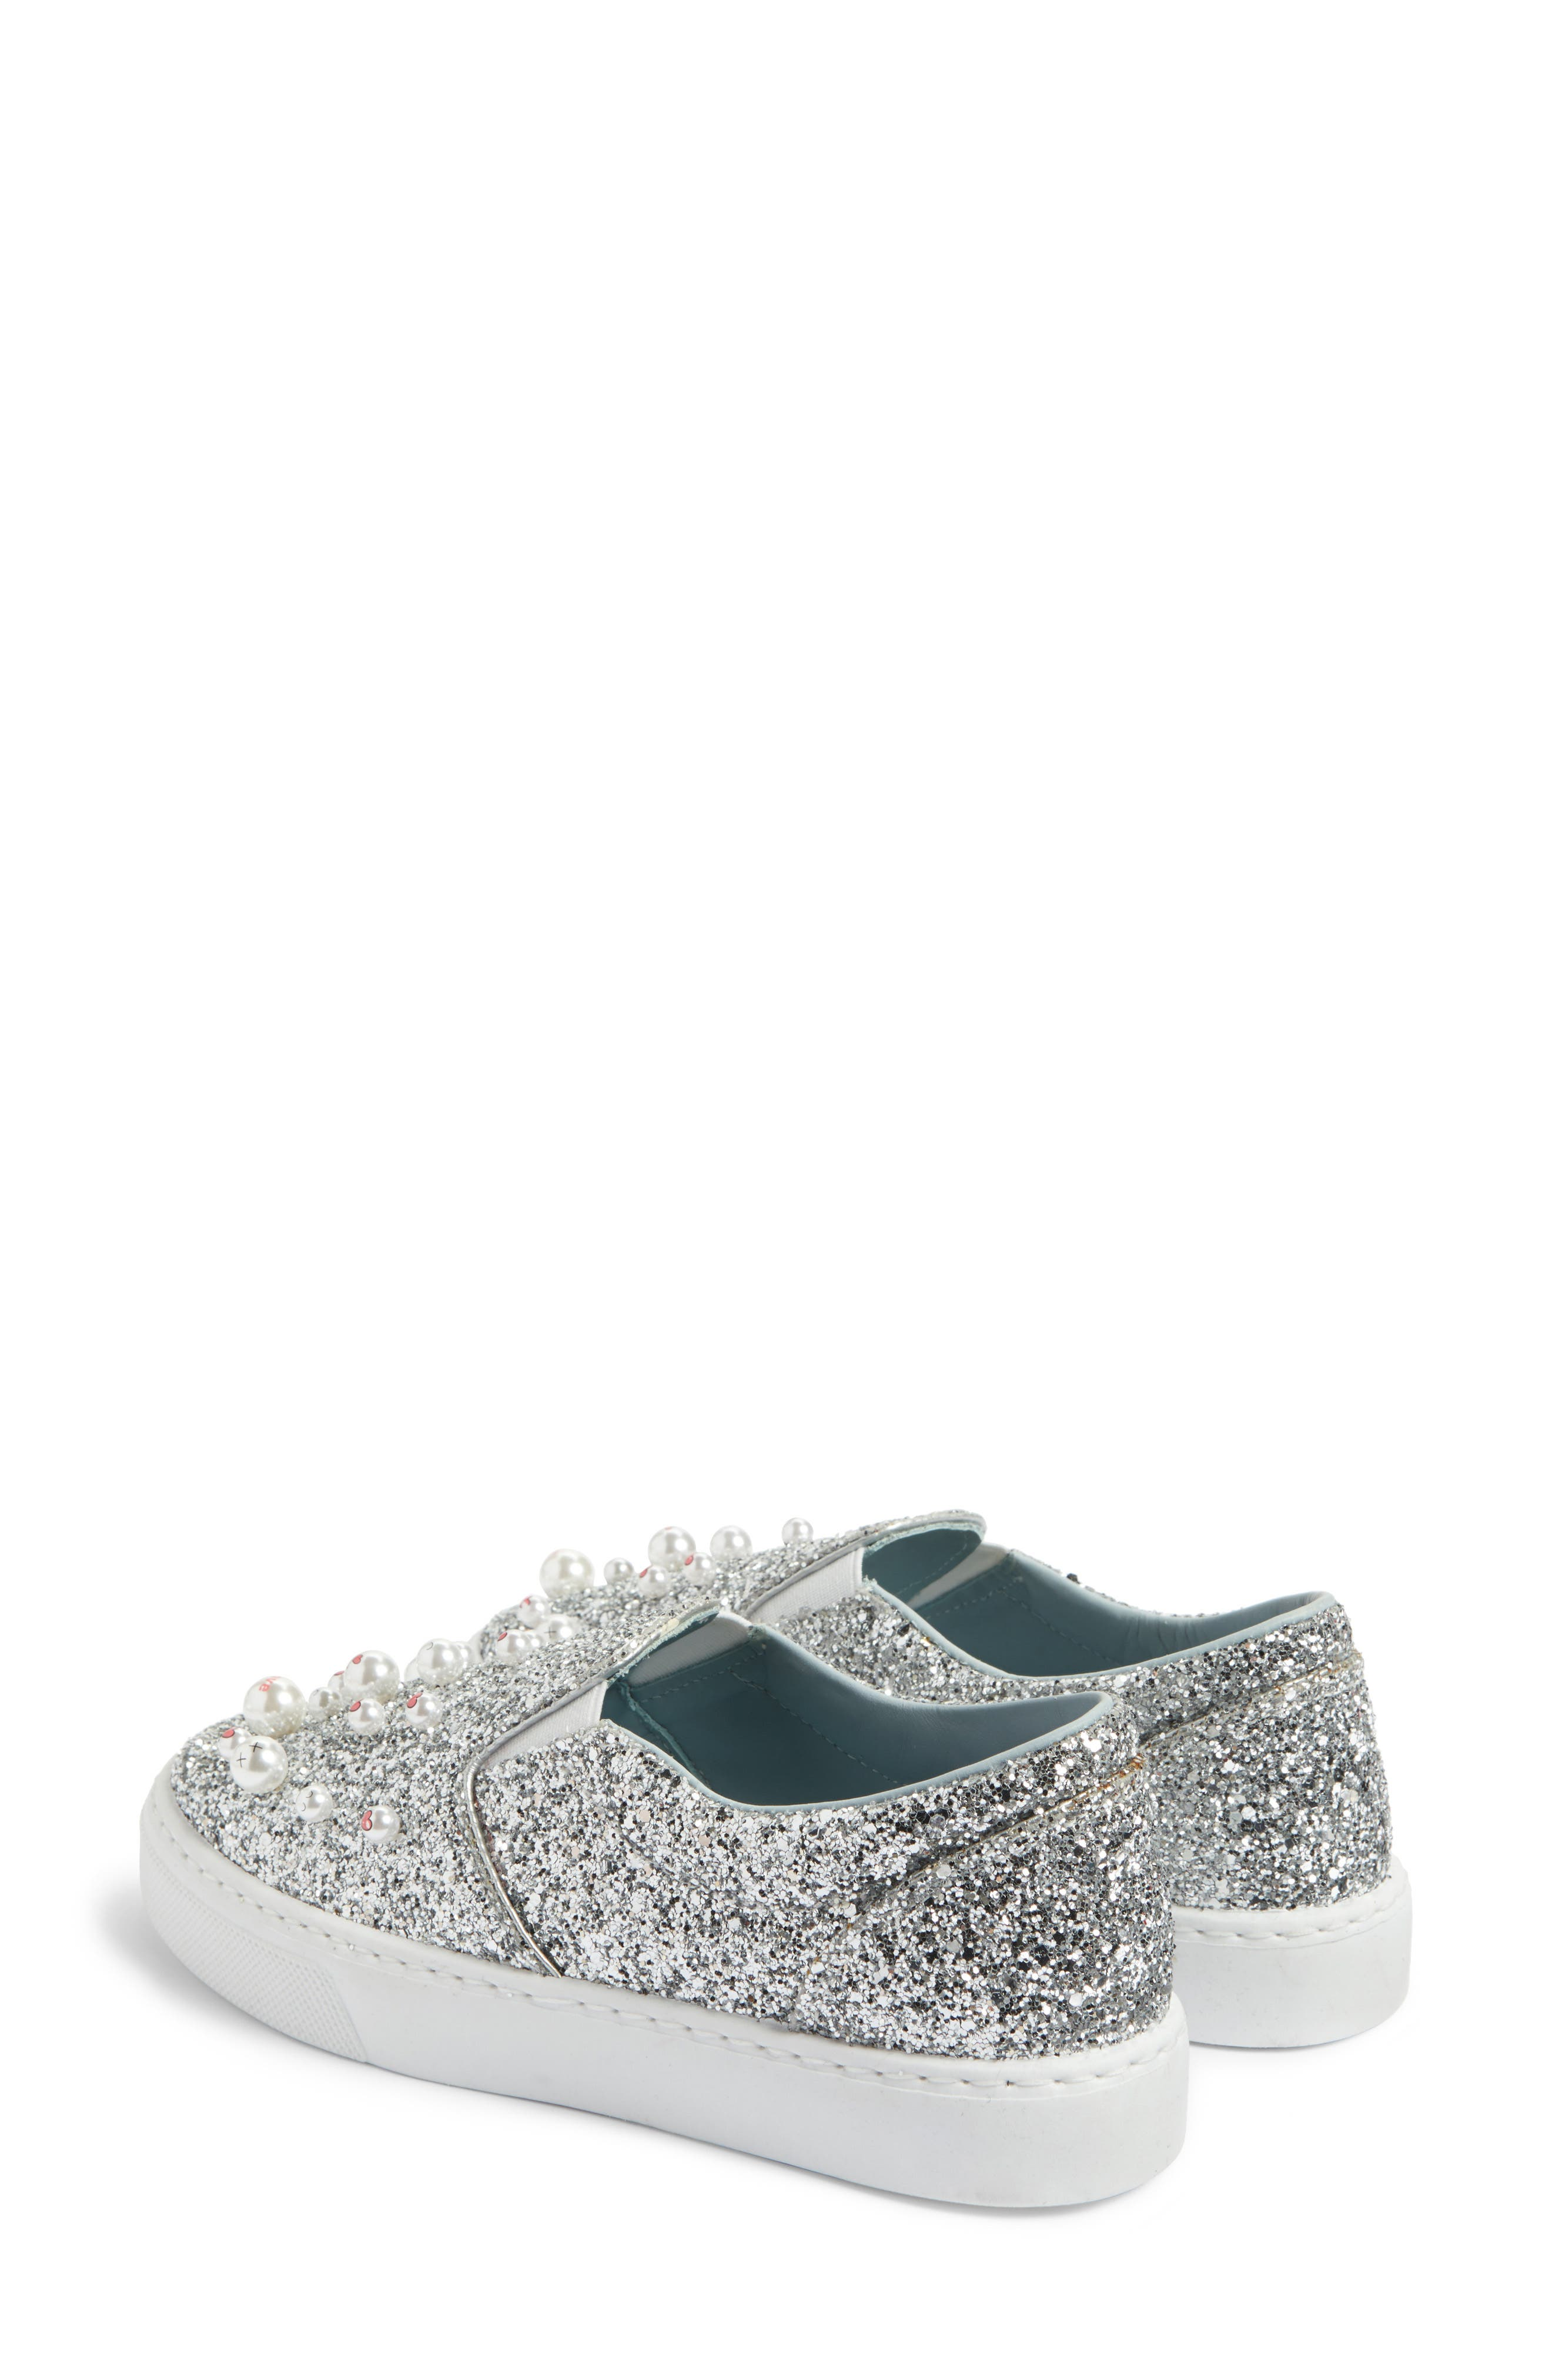 Candies Embellished Slip-On Sneaker,                             Alternate thumbnail 3, color,                             Silver